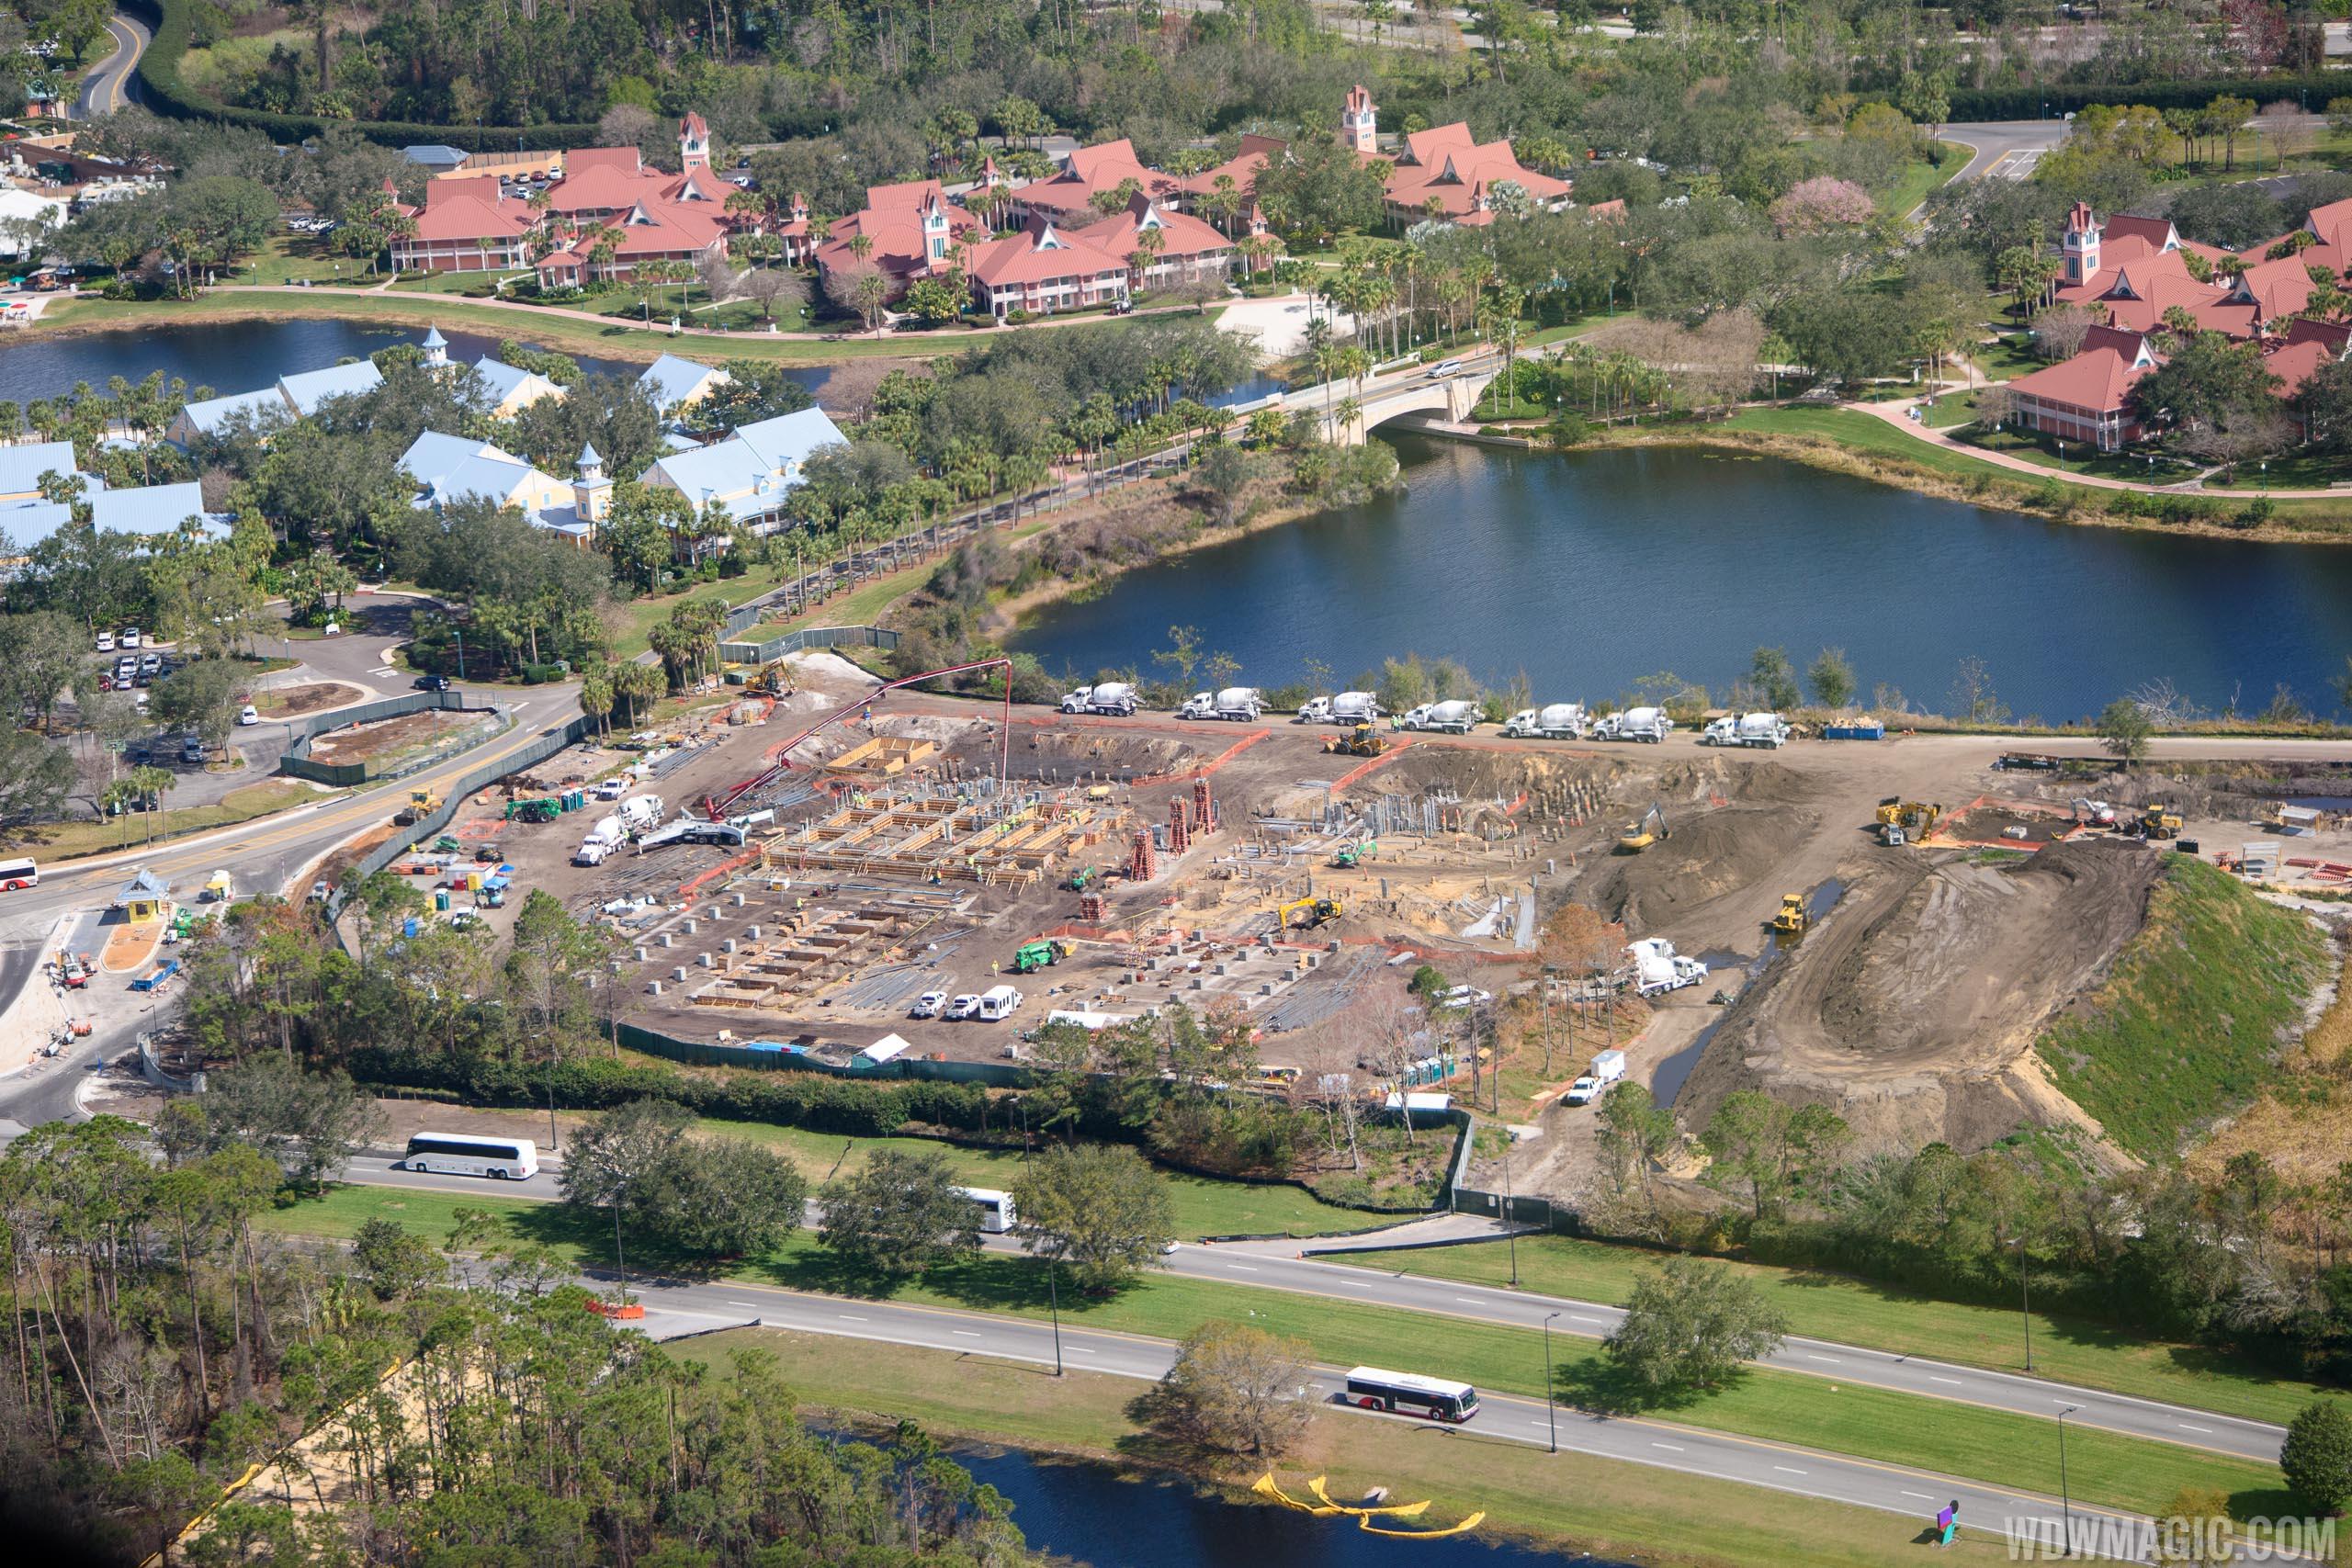 Disney Skyliner construction aerial views - February 2018